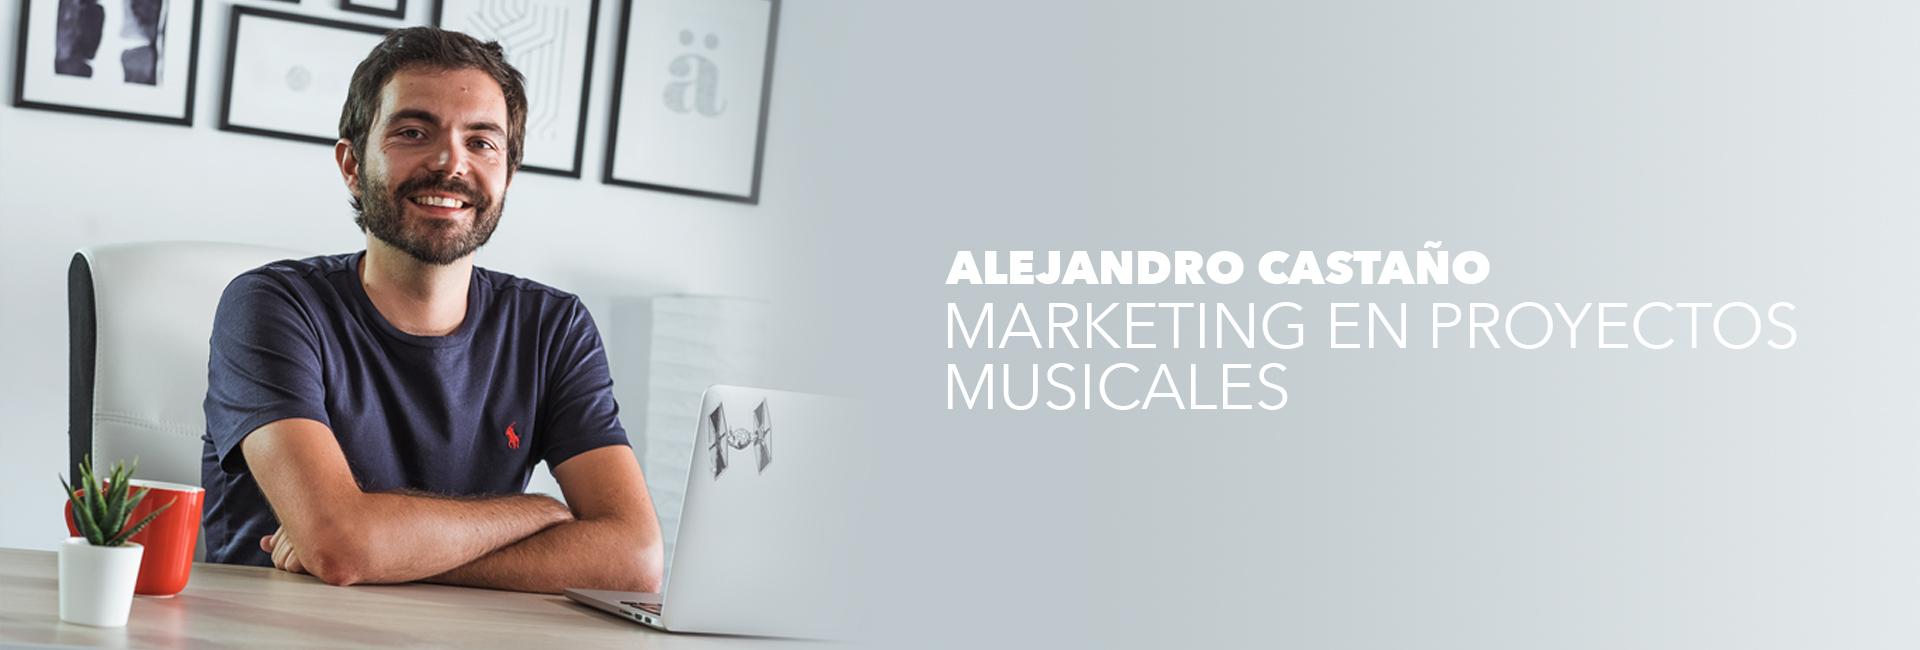 formacion_marketing_para_artistas_banner